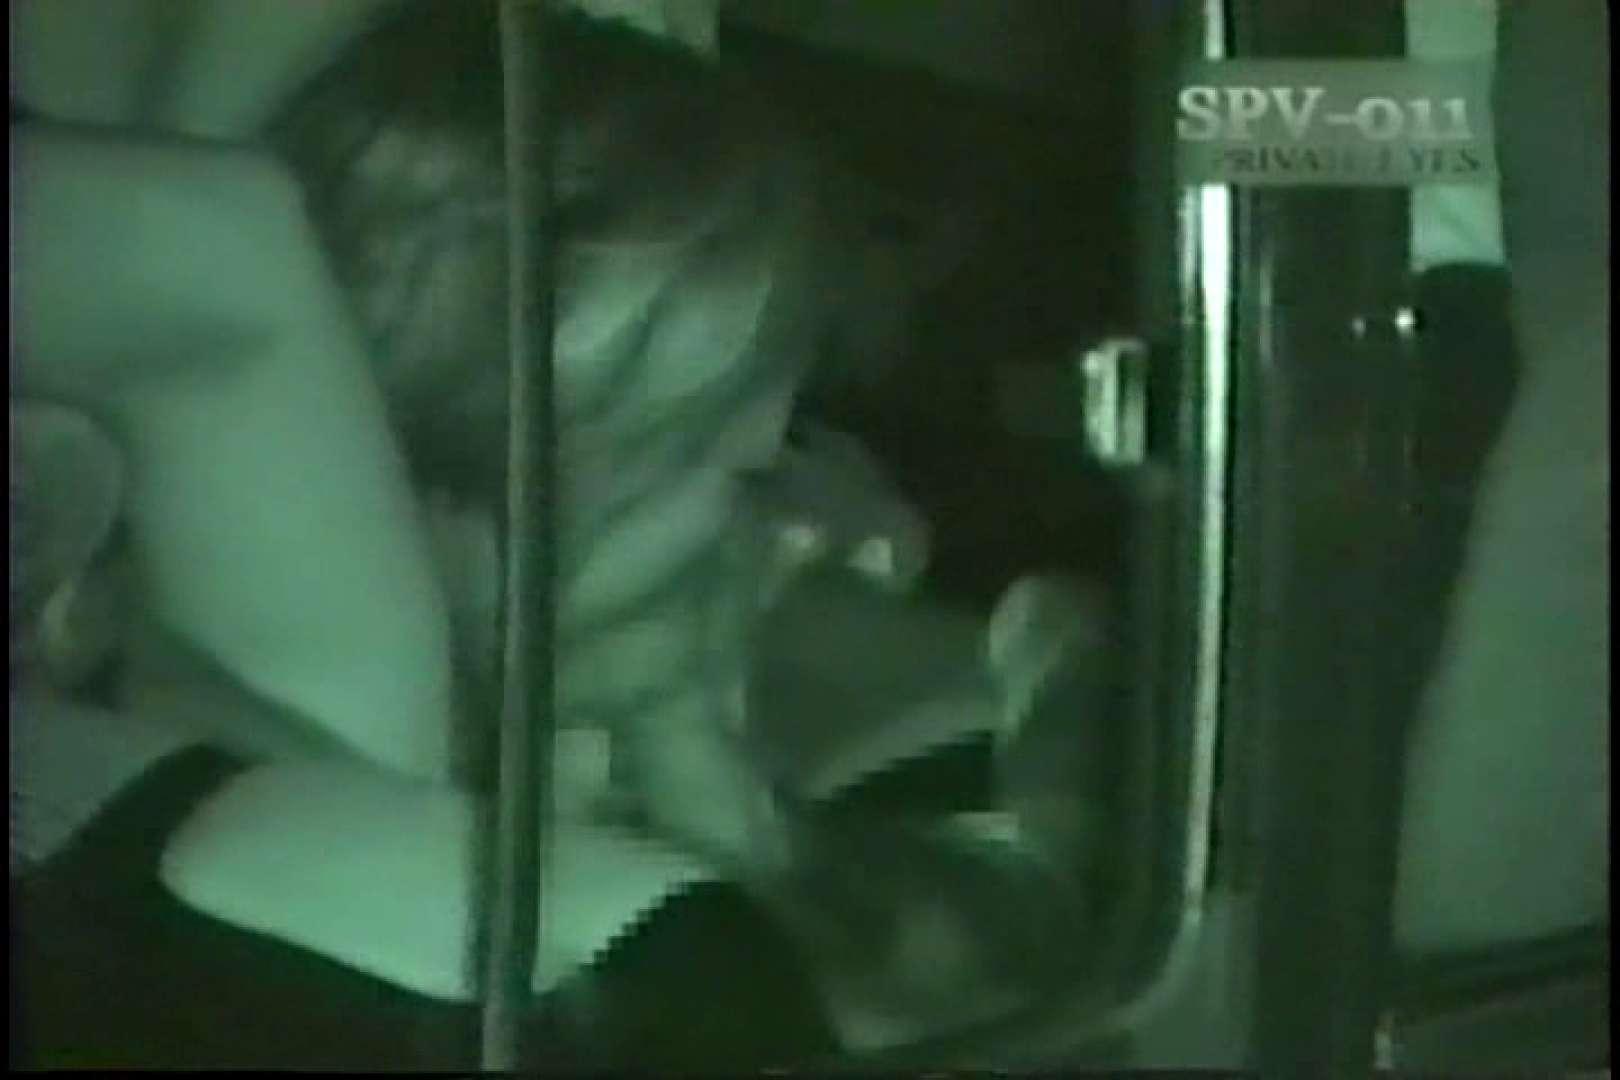 高画質版!SPD-011 盗撮 カーセックス黙示録 (VHS) セックス | カーセックス  94連発 19